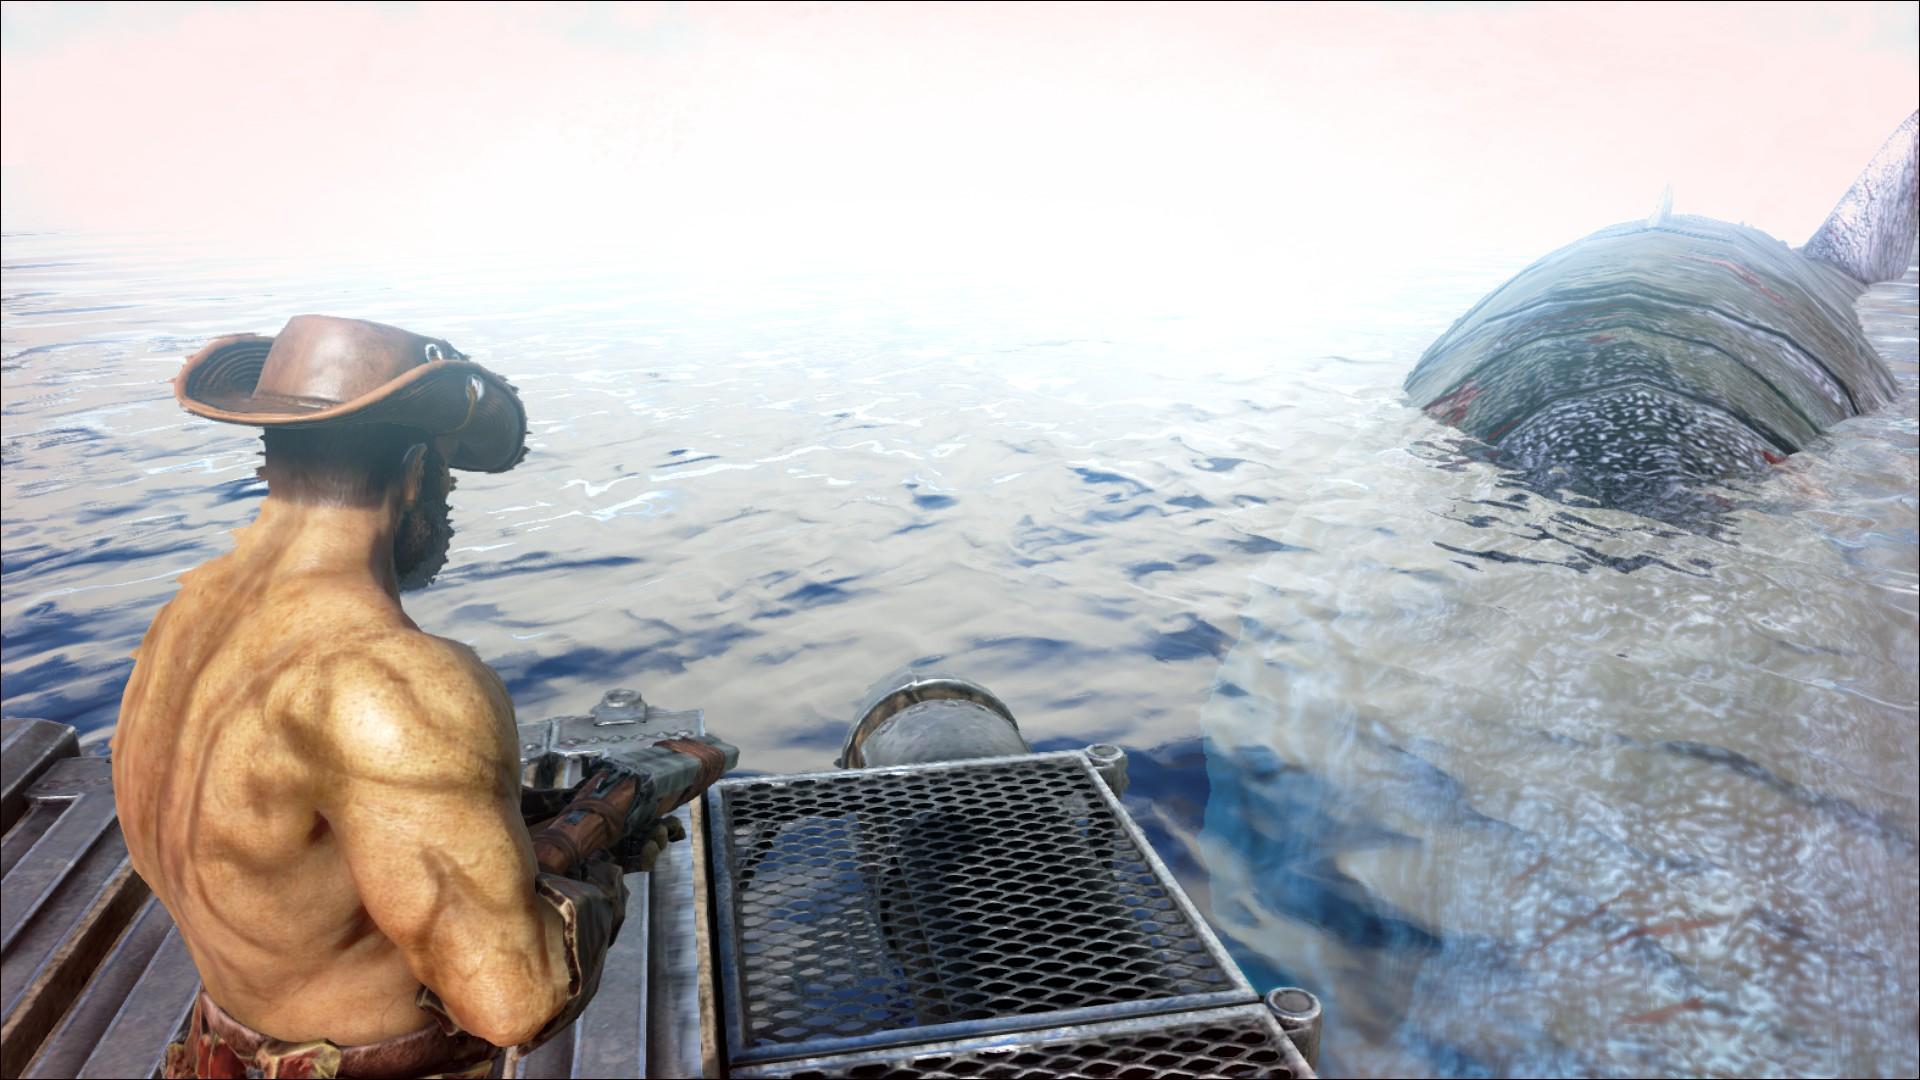 Ark leedsichthys hunt: how I killed the Jaws of Ark